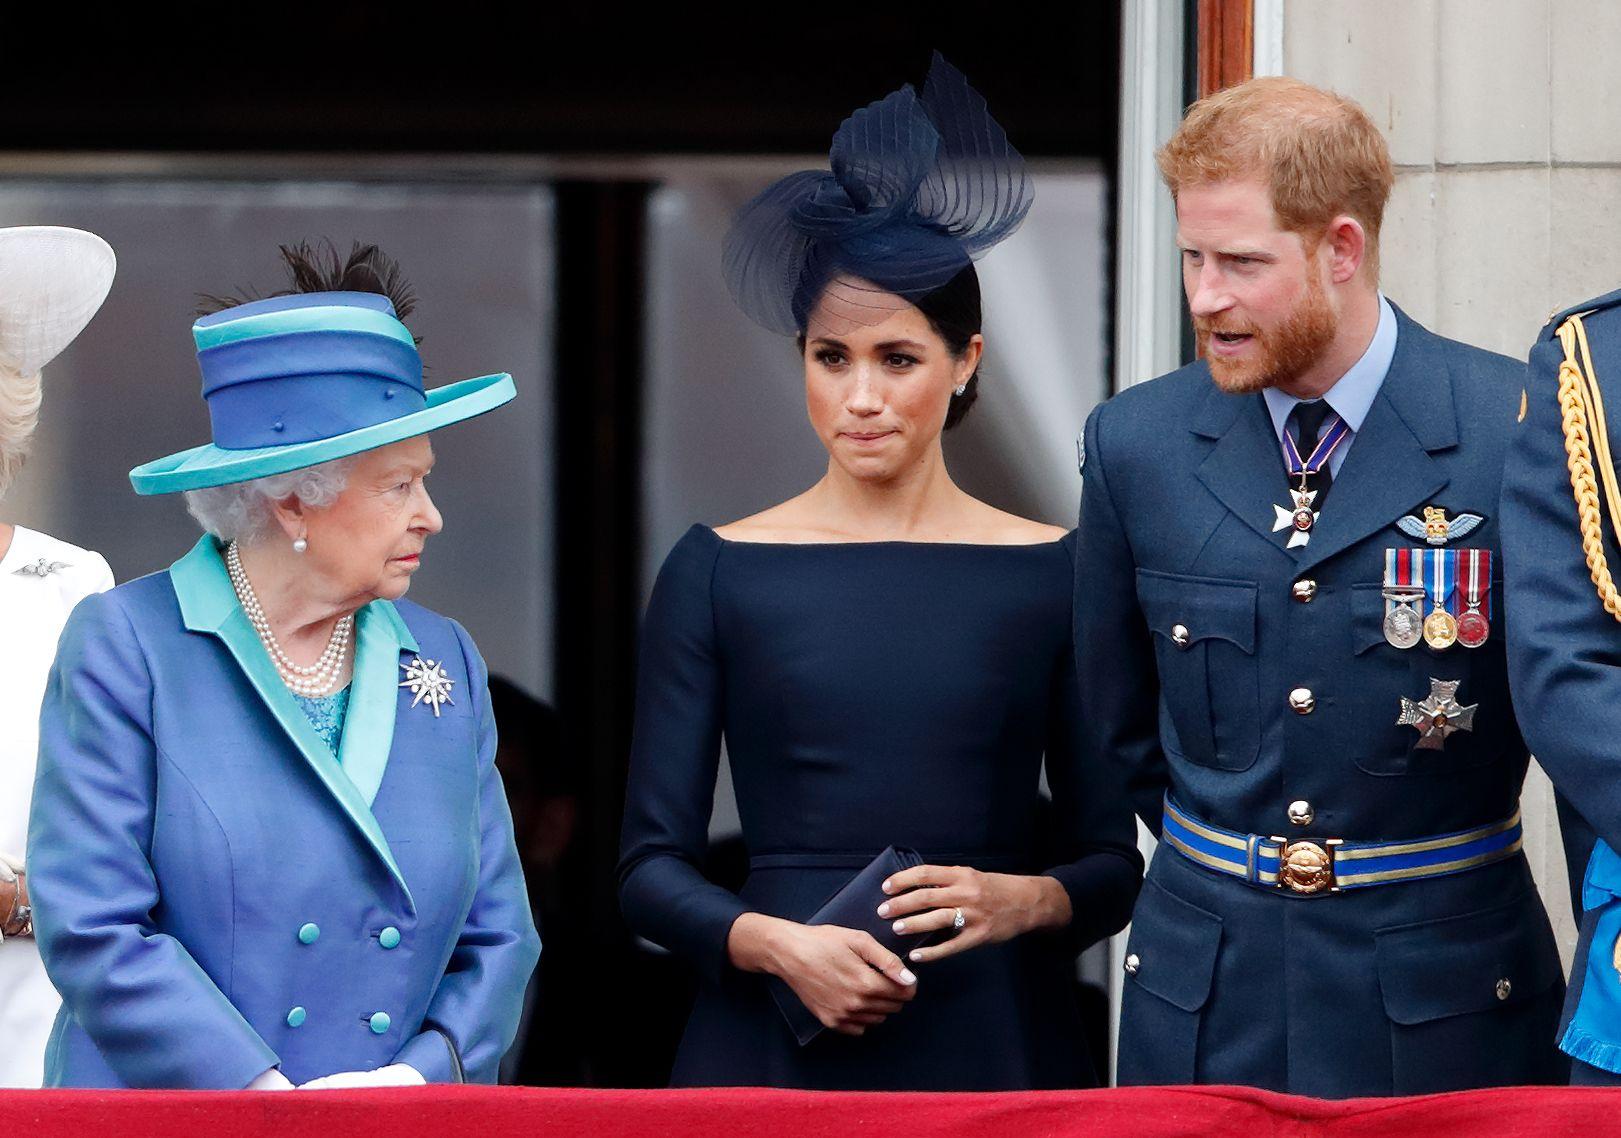 Queen Elizabeth II, Meghan Markle, Prince Harry